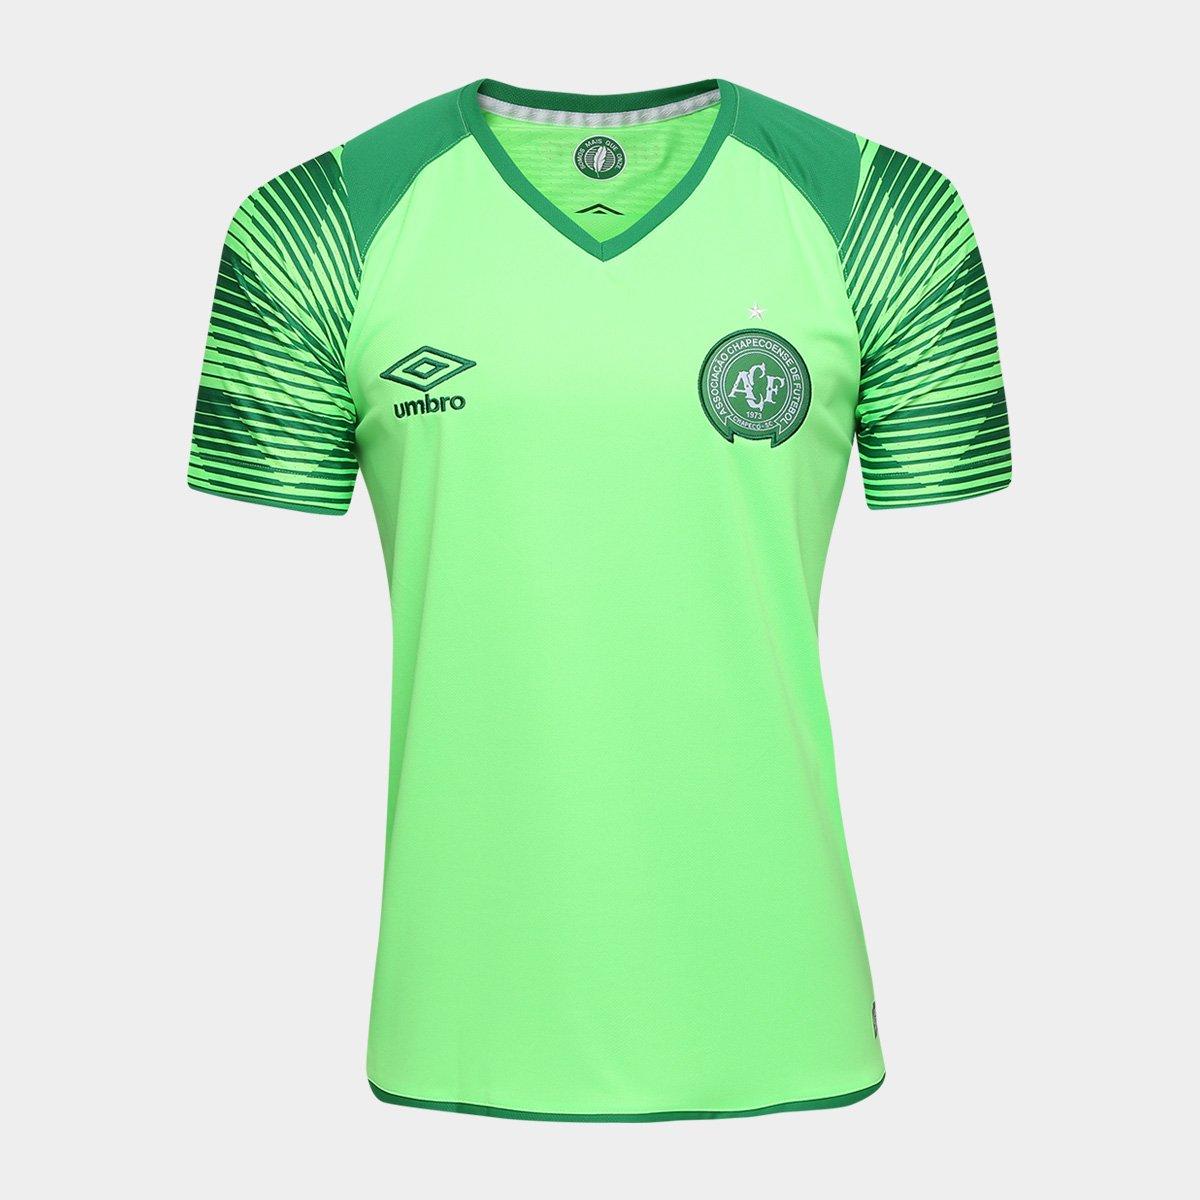 1225824cb71bf Camisa Chapecoense Goleiro 17/18 nº 1 Torcedor Umbro Masculina - Verde  claro | Loja da Chape